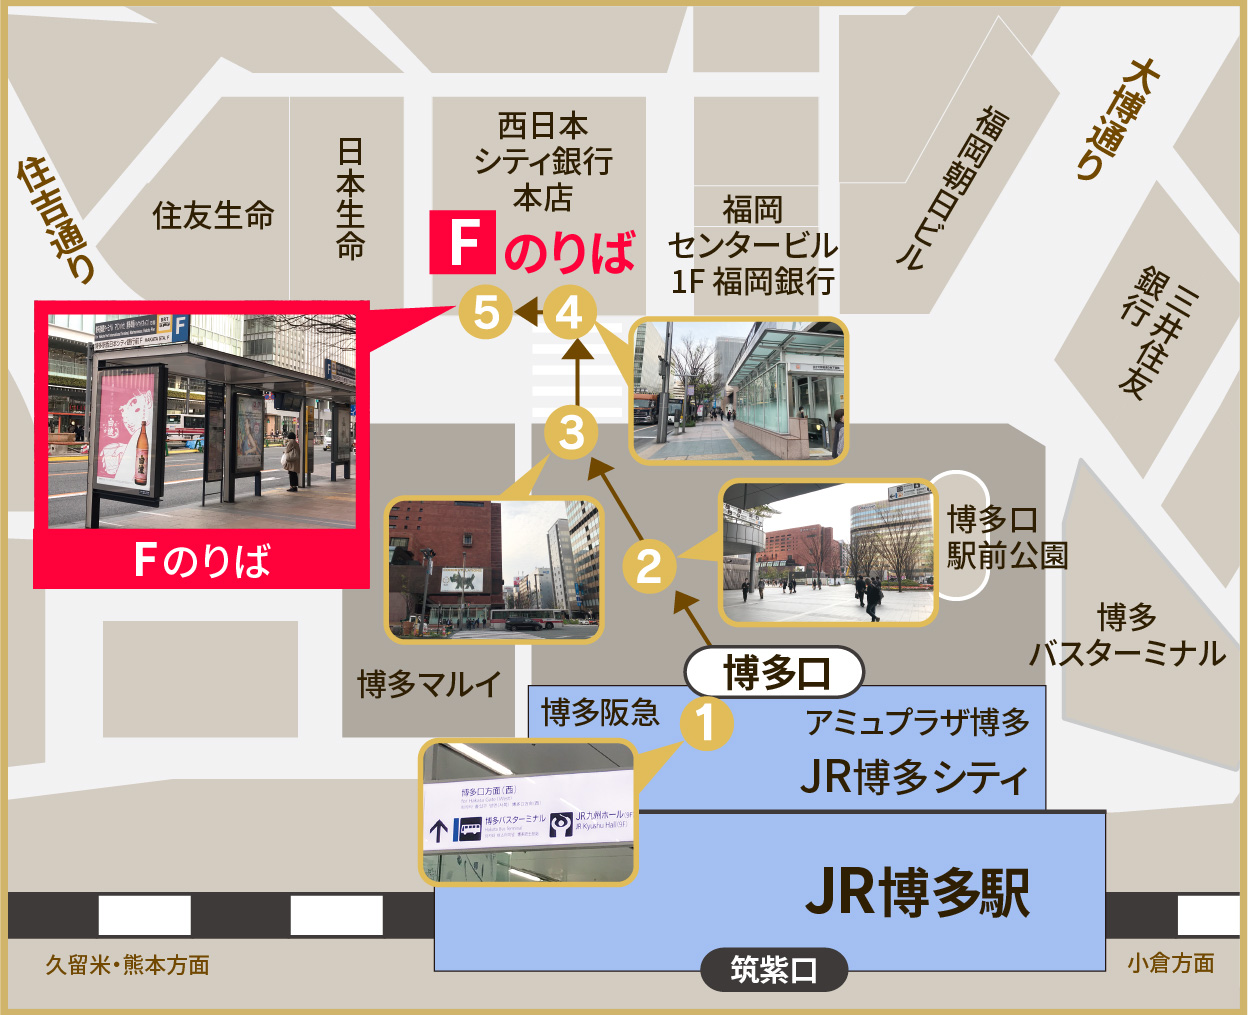 JR博多周辺マップ